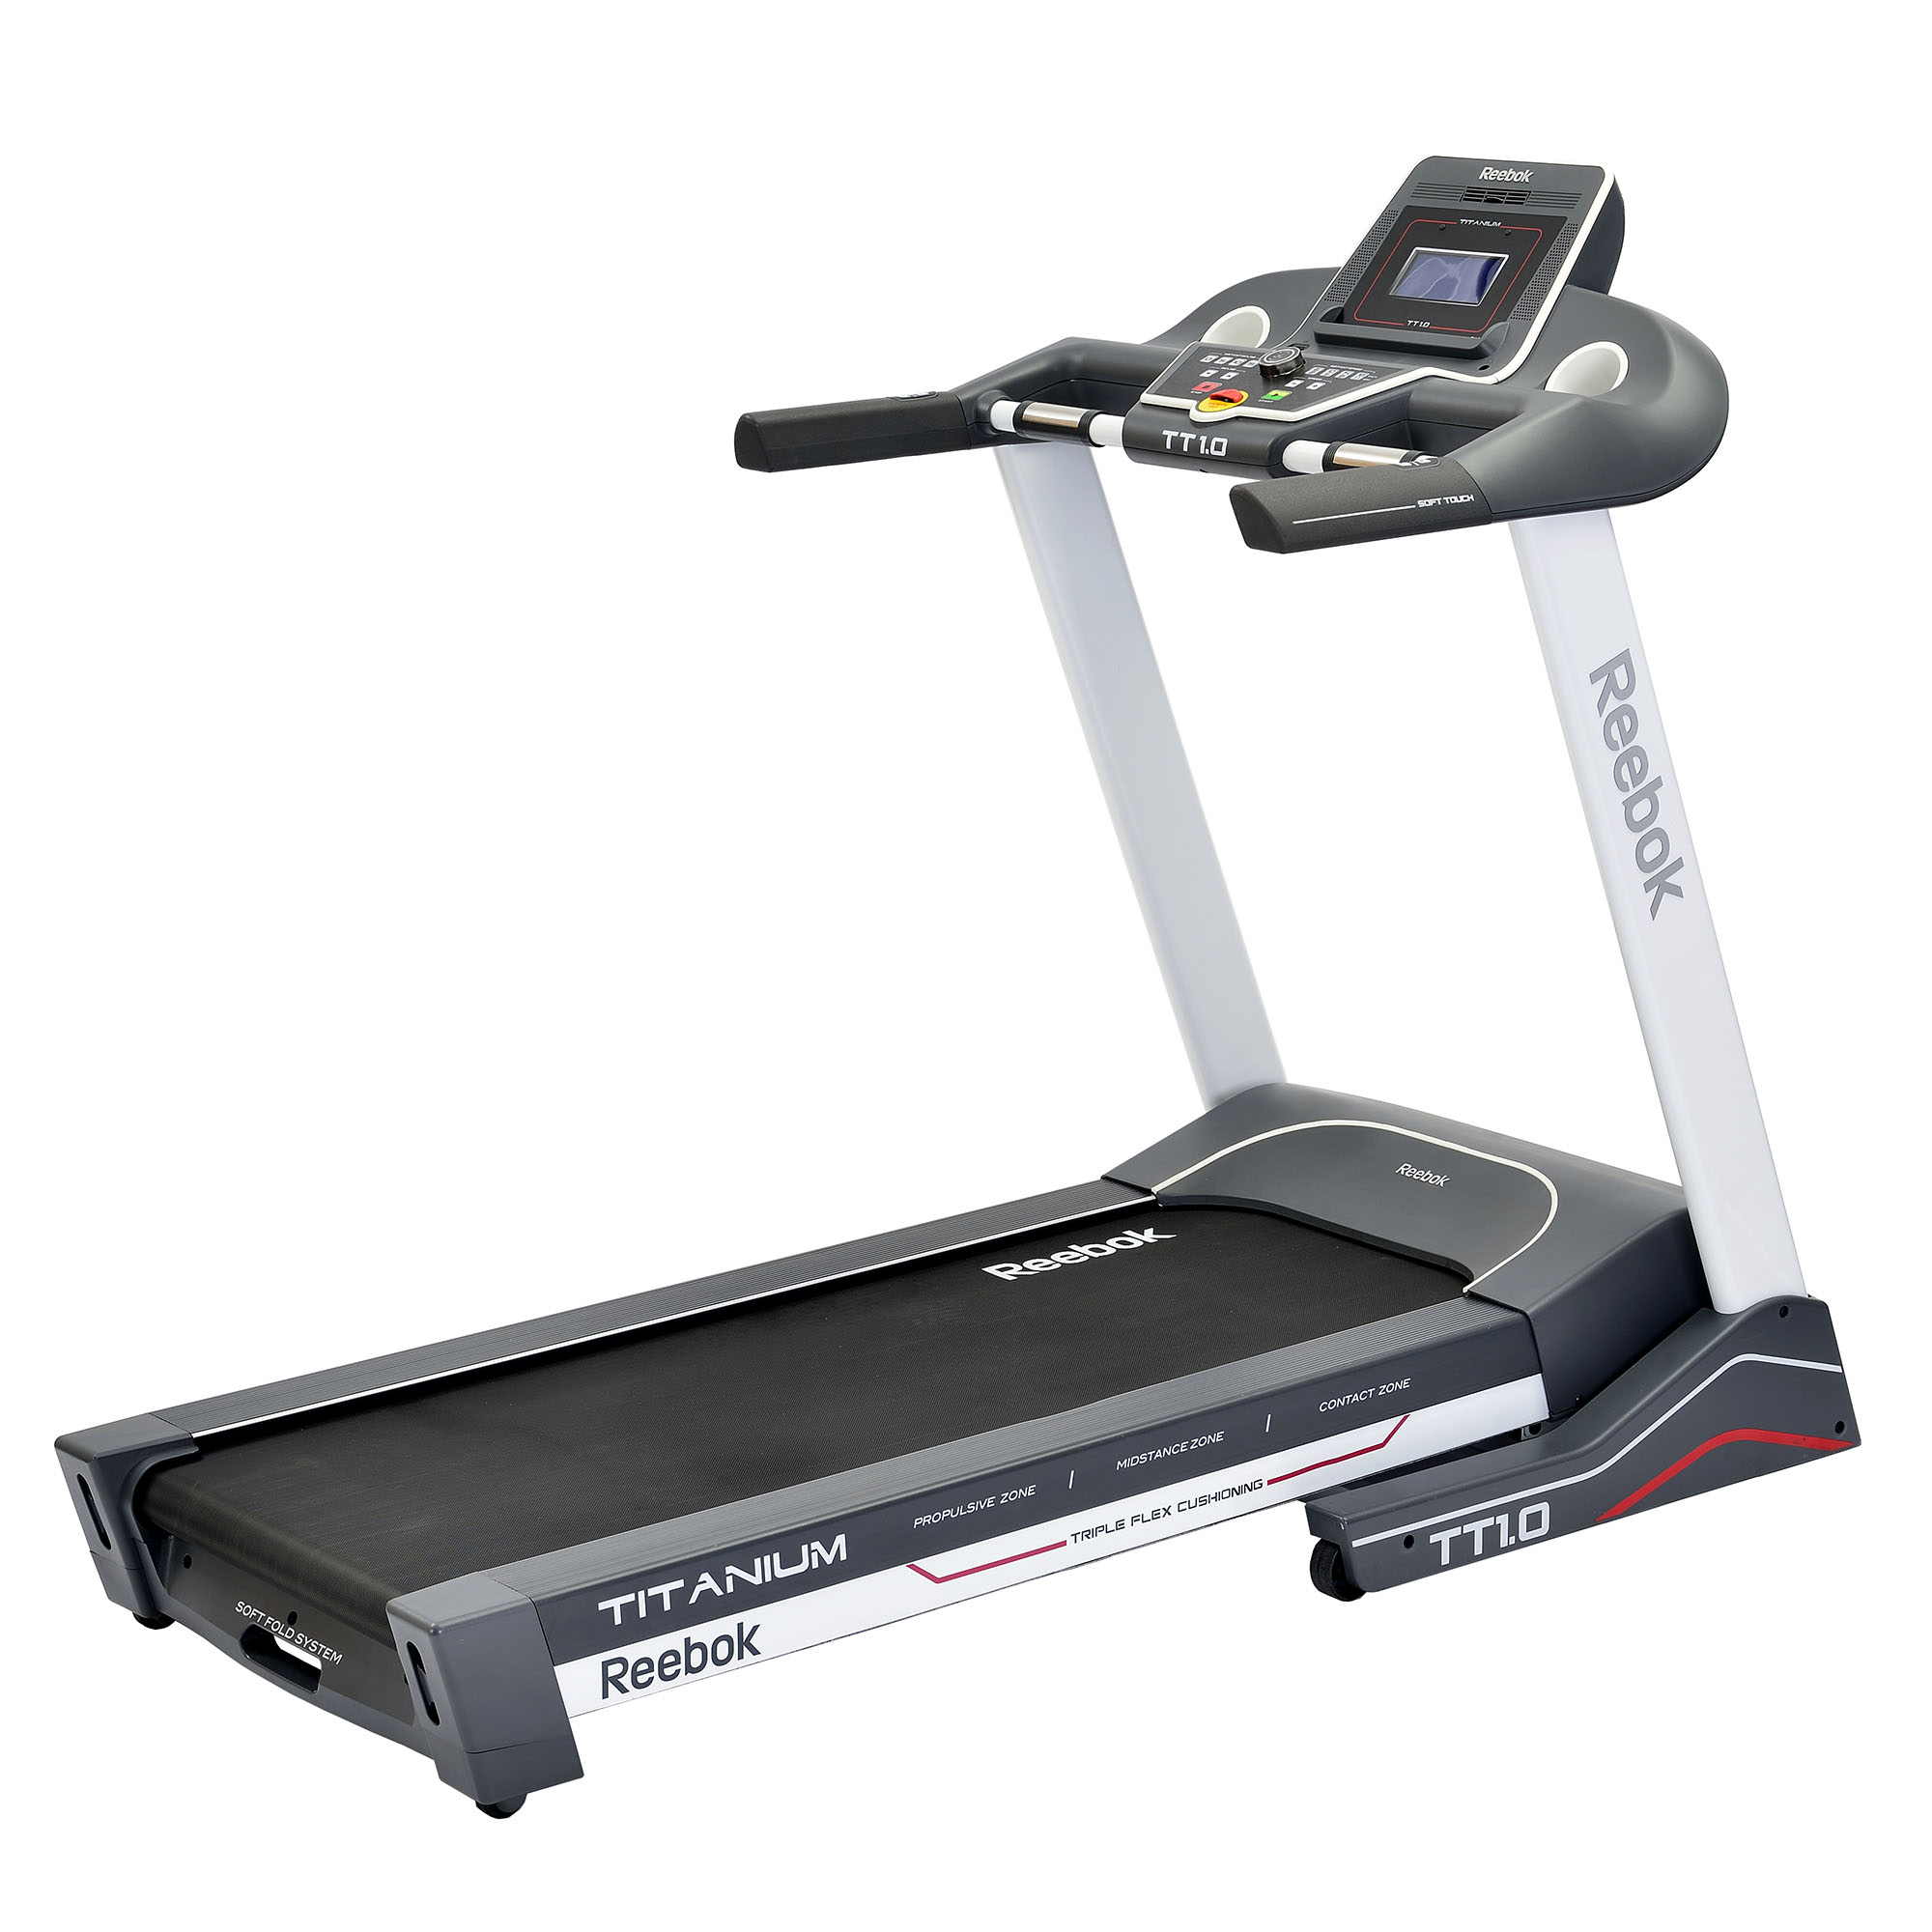 Reebok Titanium TT1.0 Treadmill